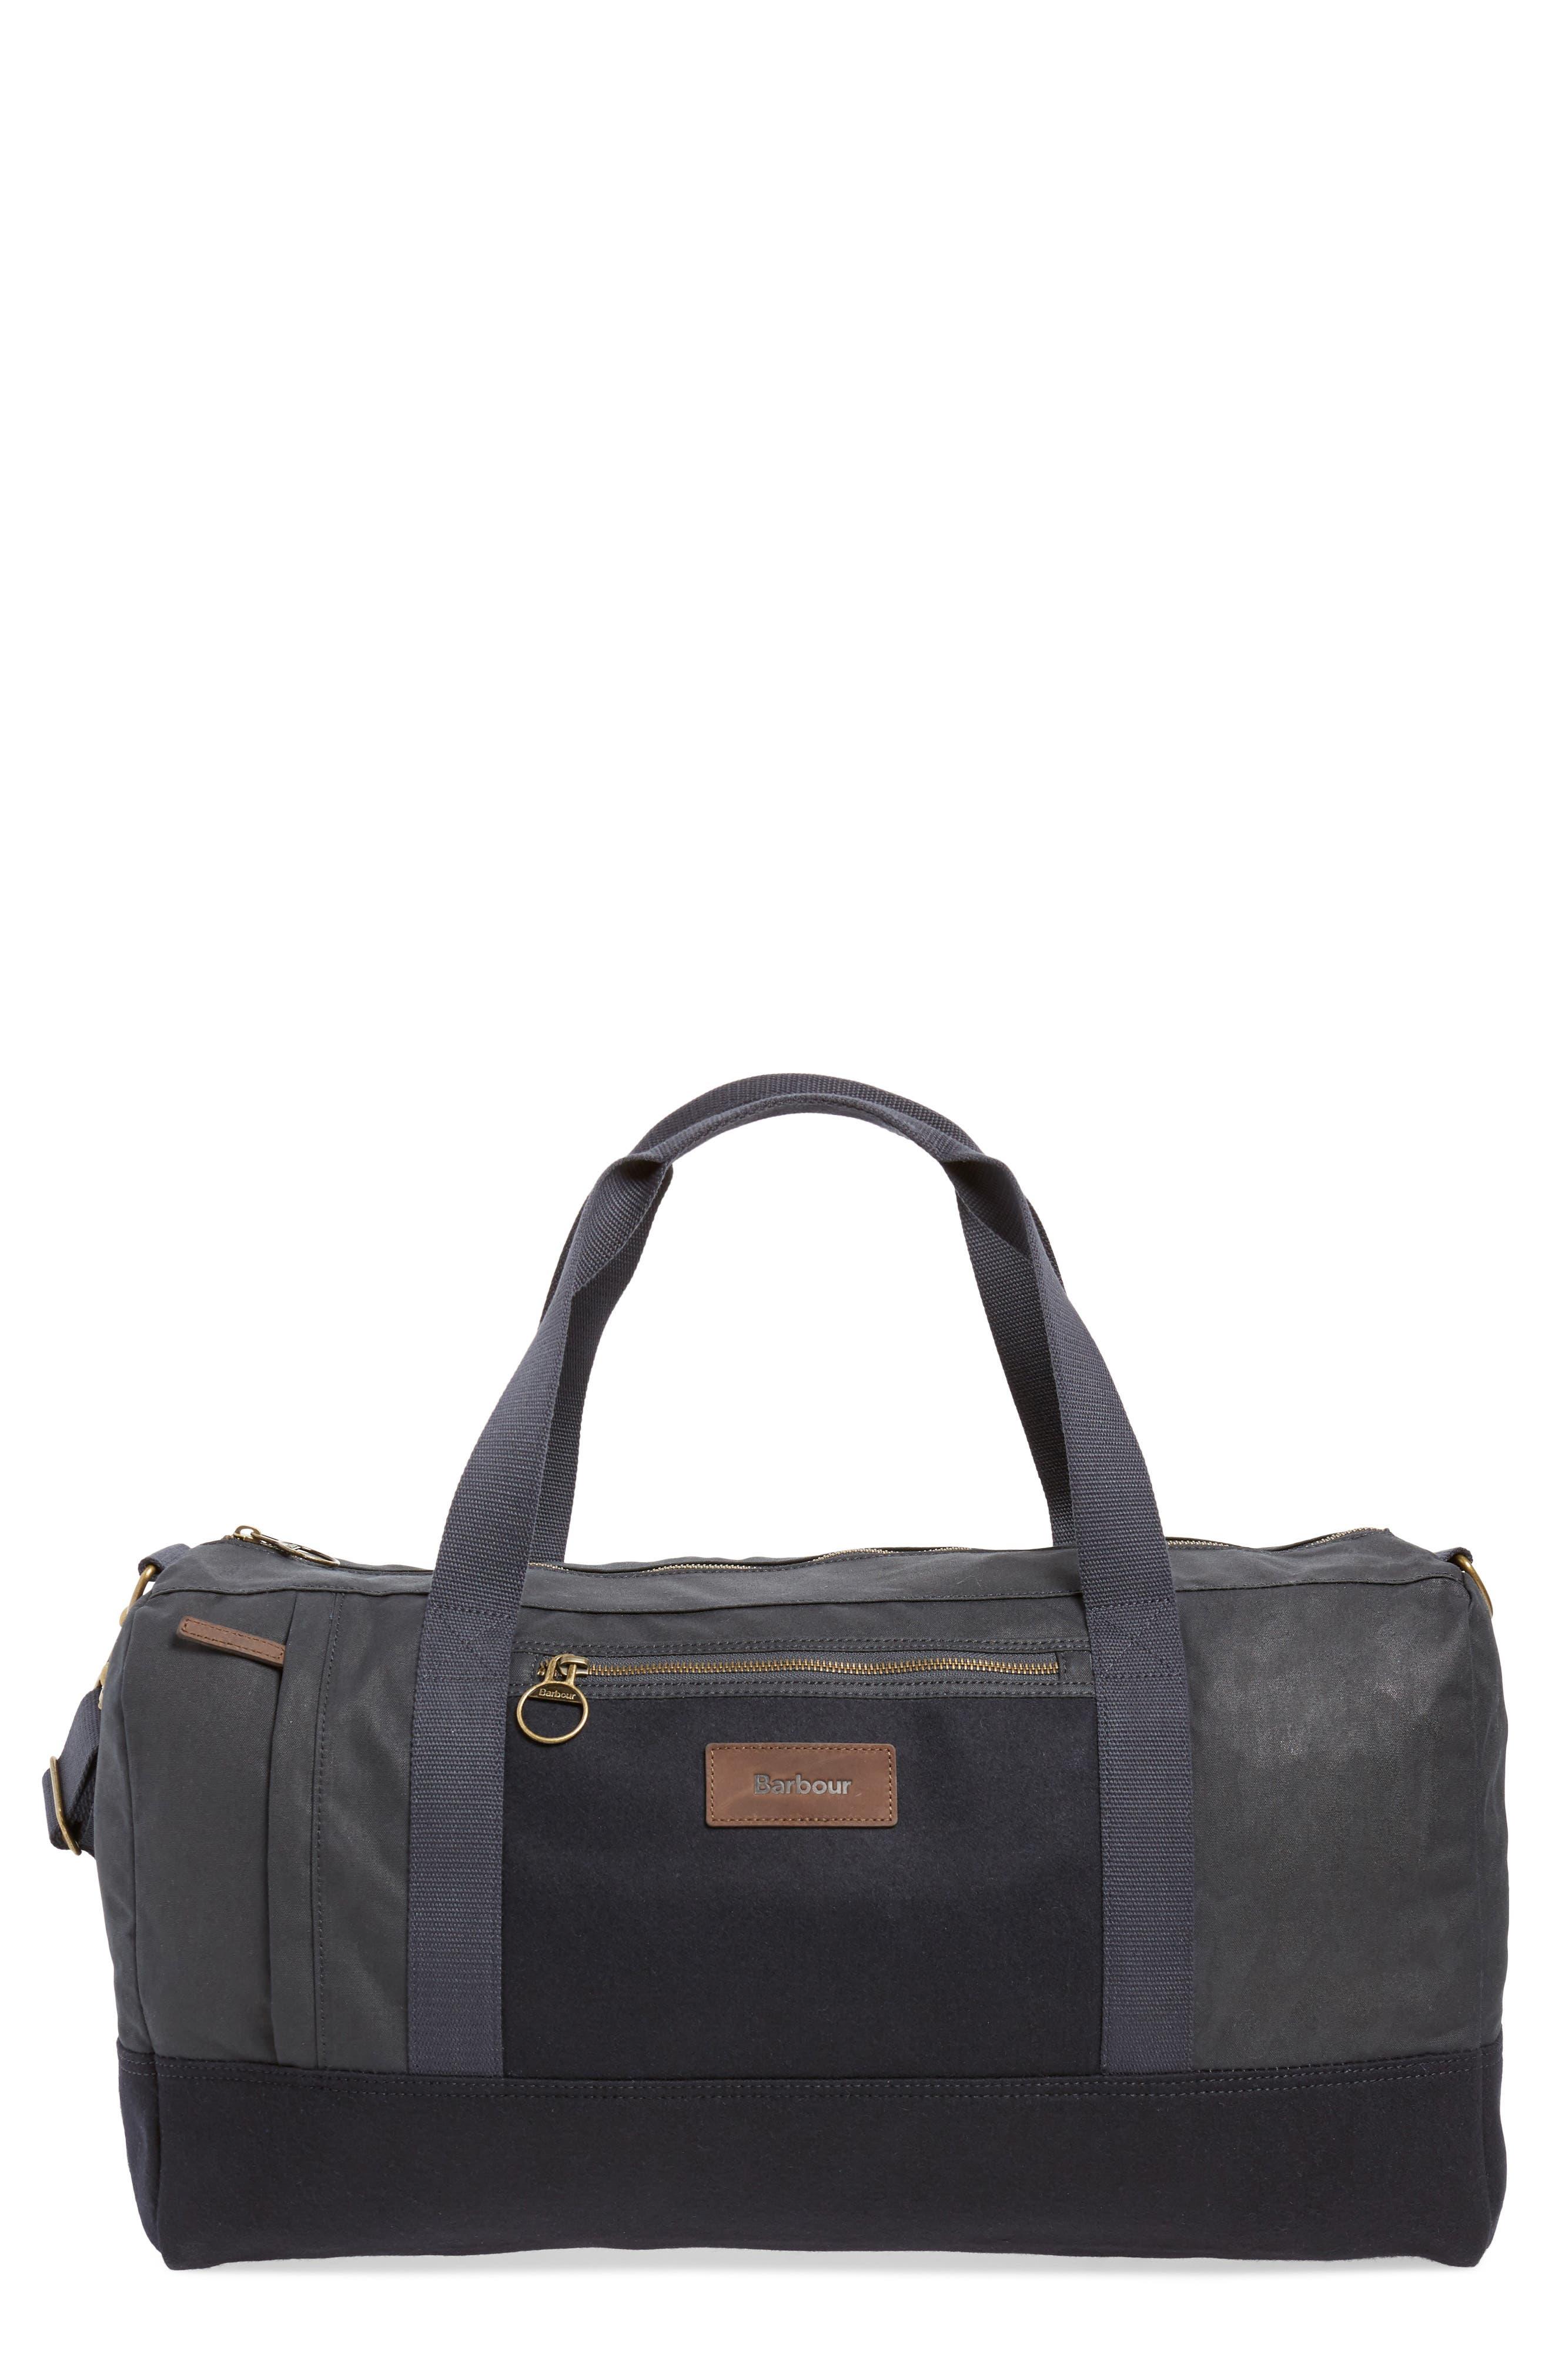 Gisburne Duffel Bag,                             Main thumbnail 1, color,                             400